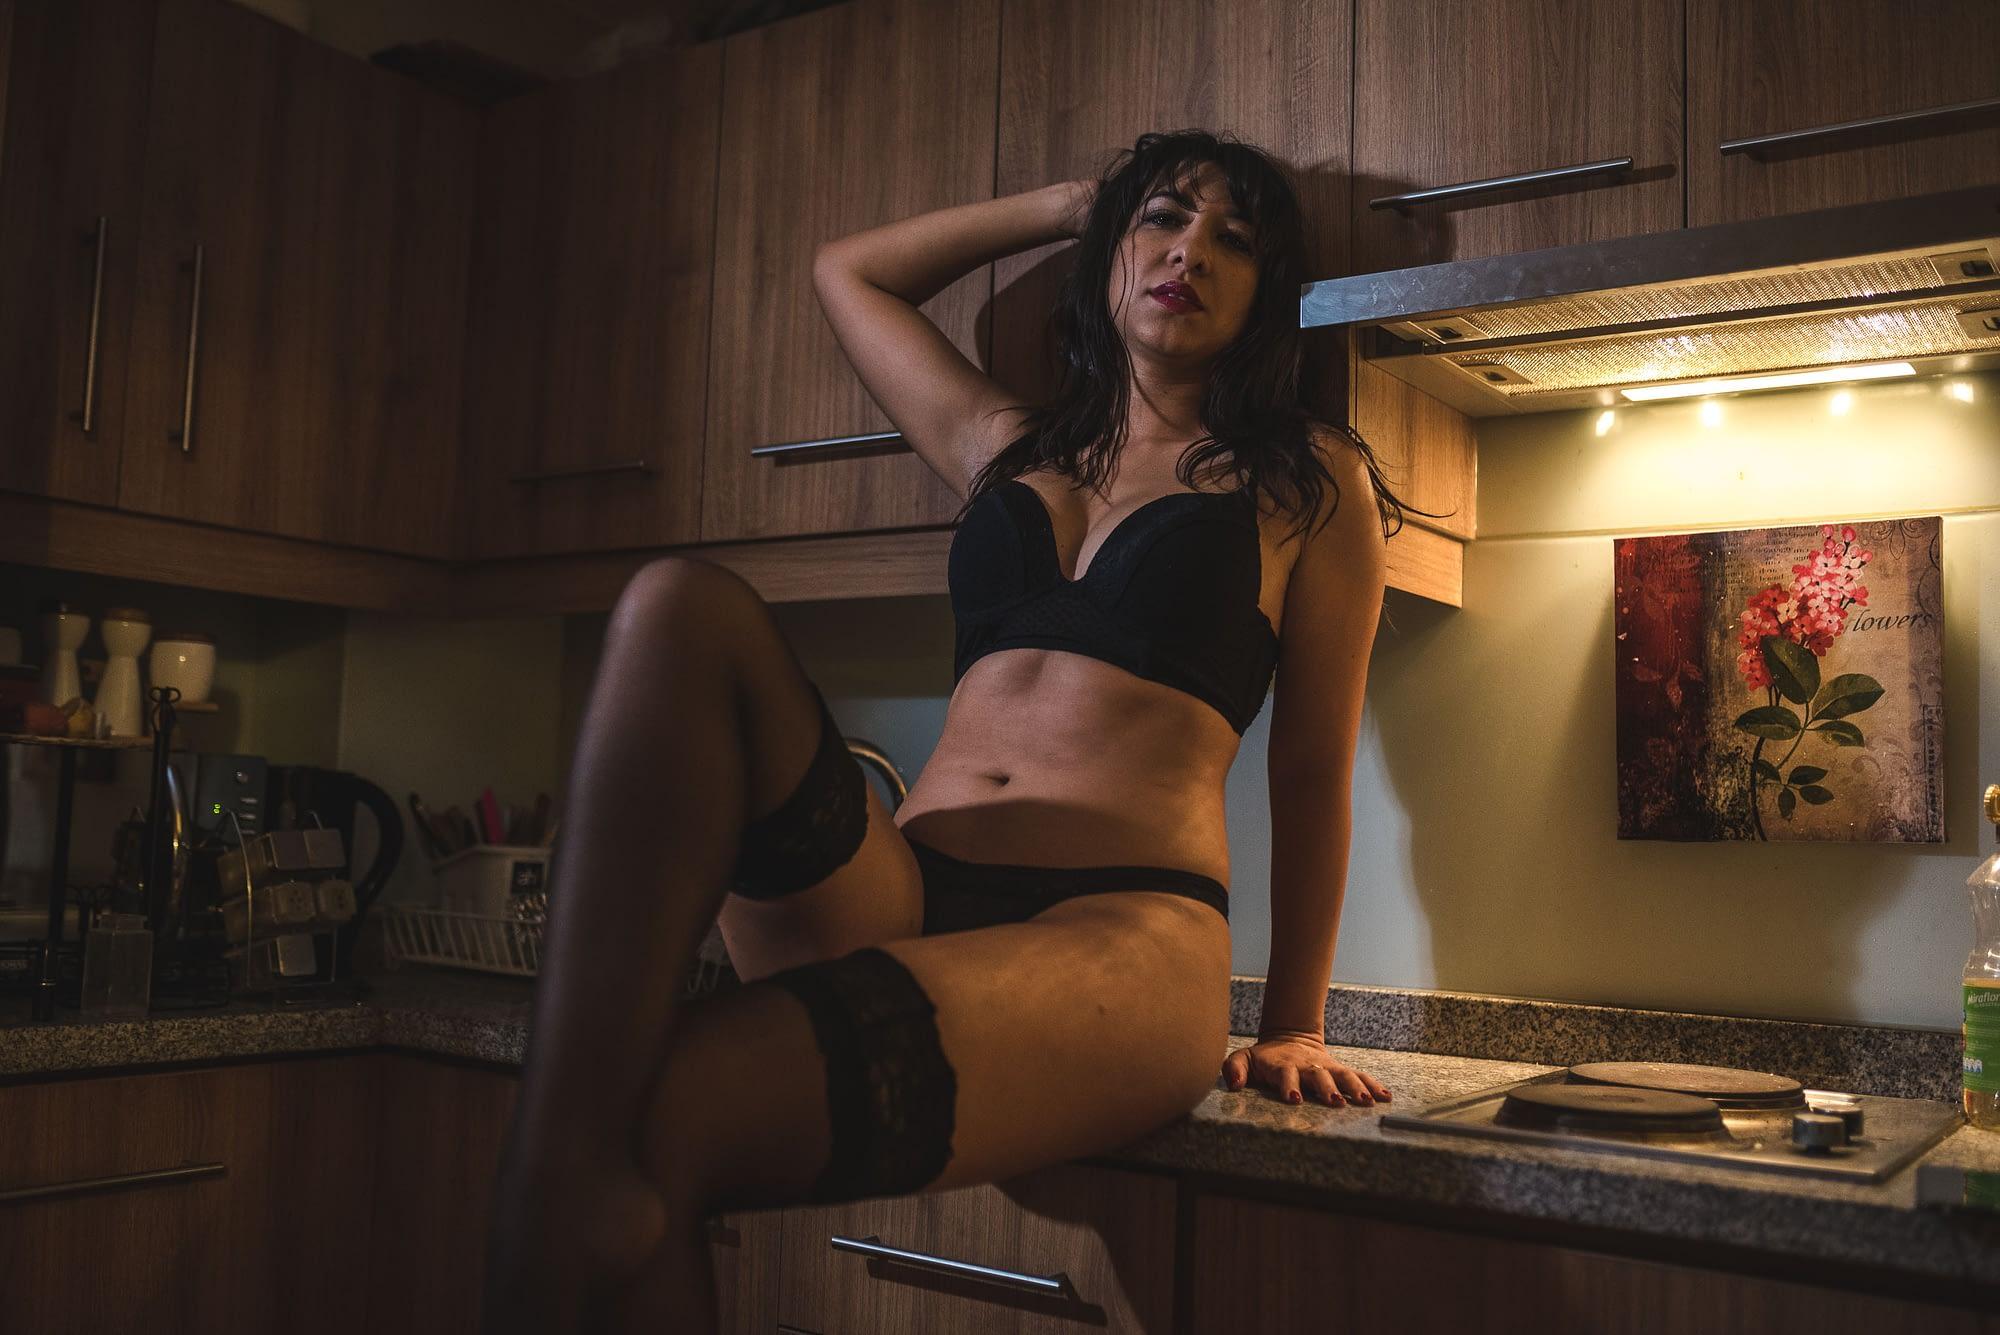 fotografia sensual-boudoir-diego mena fotografo